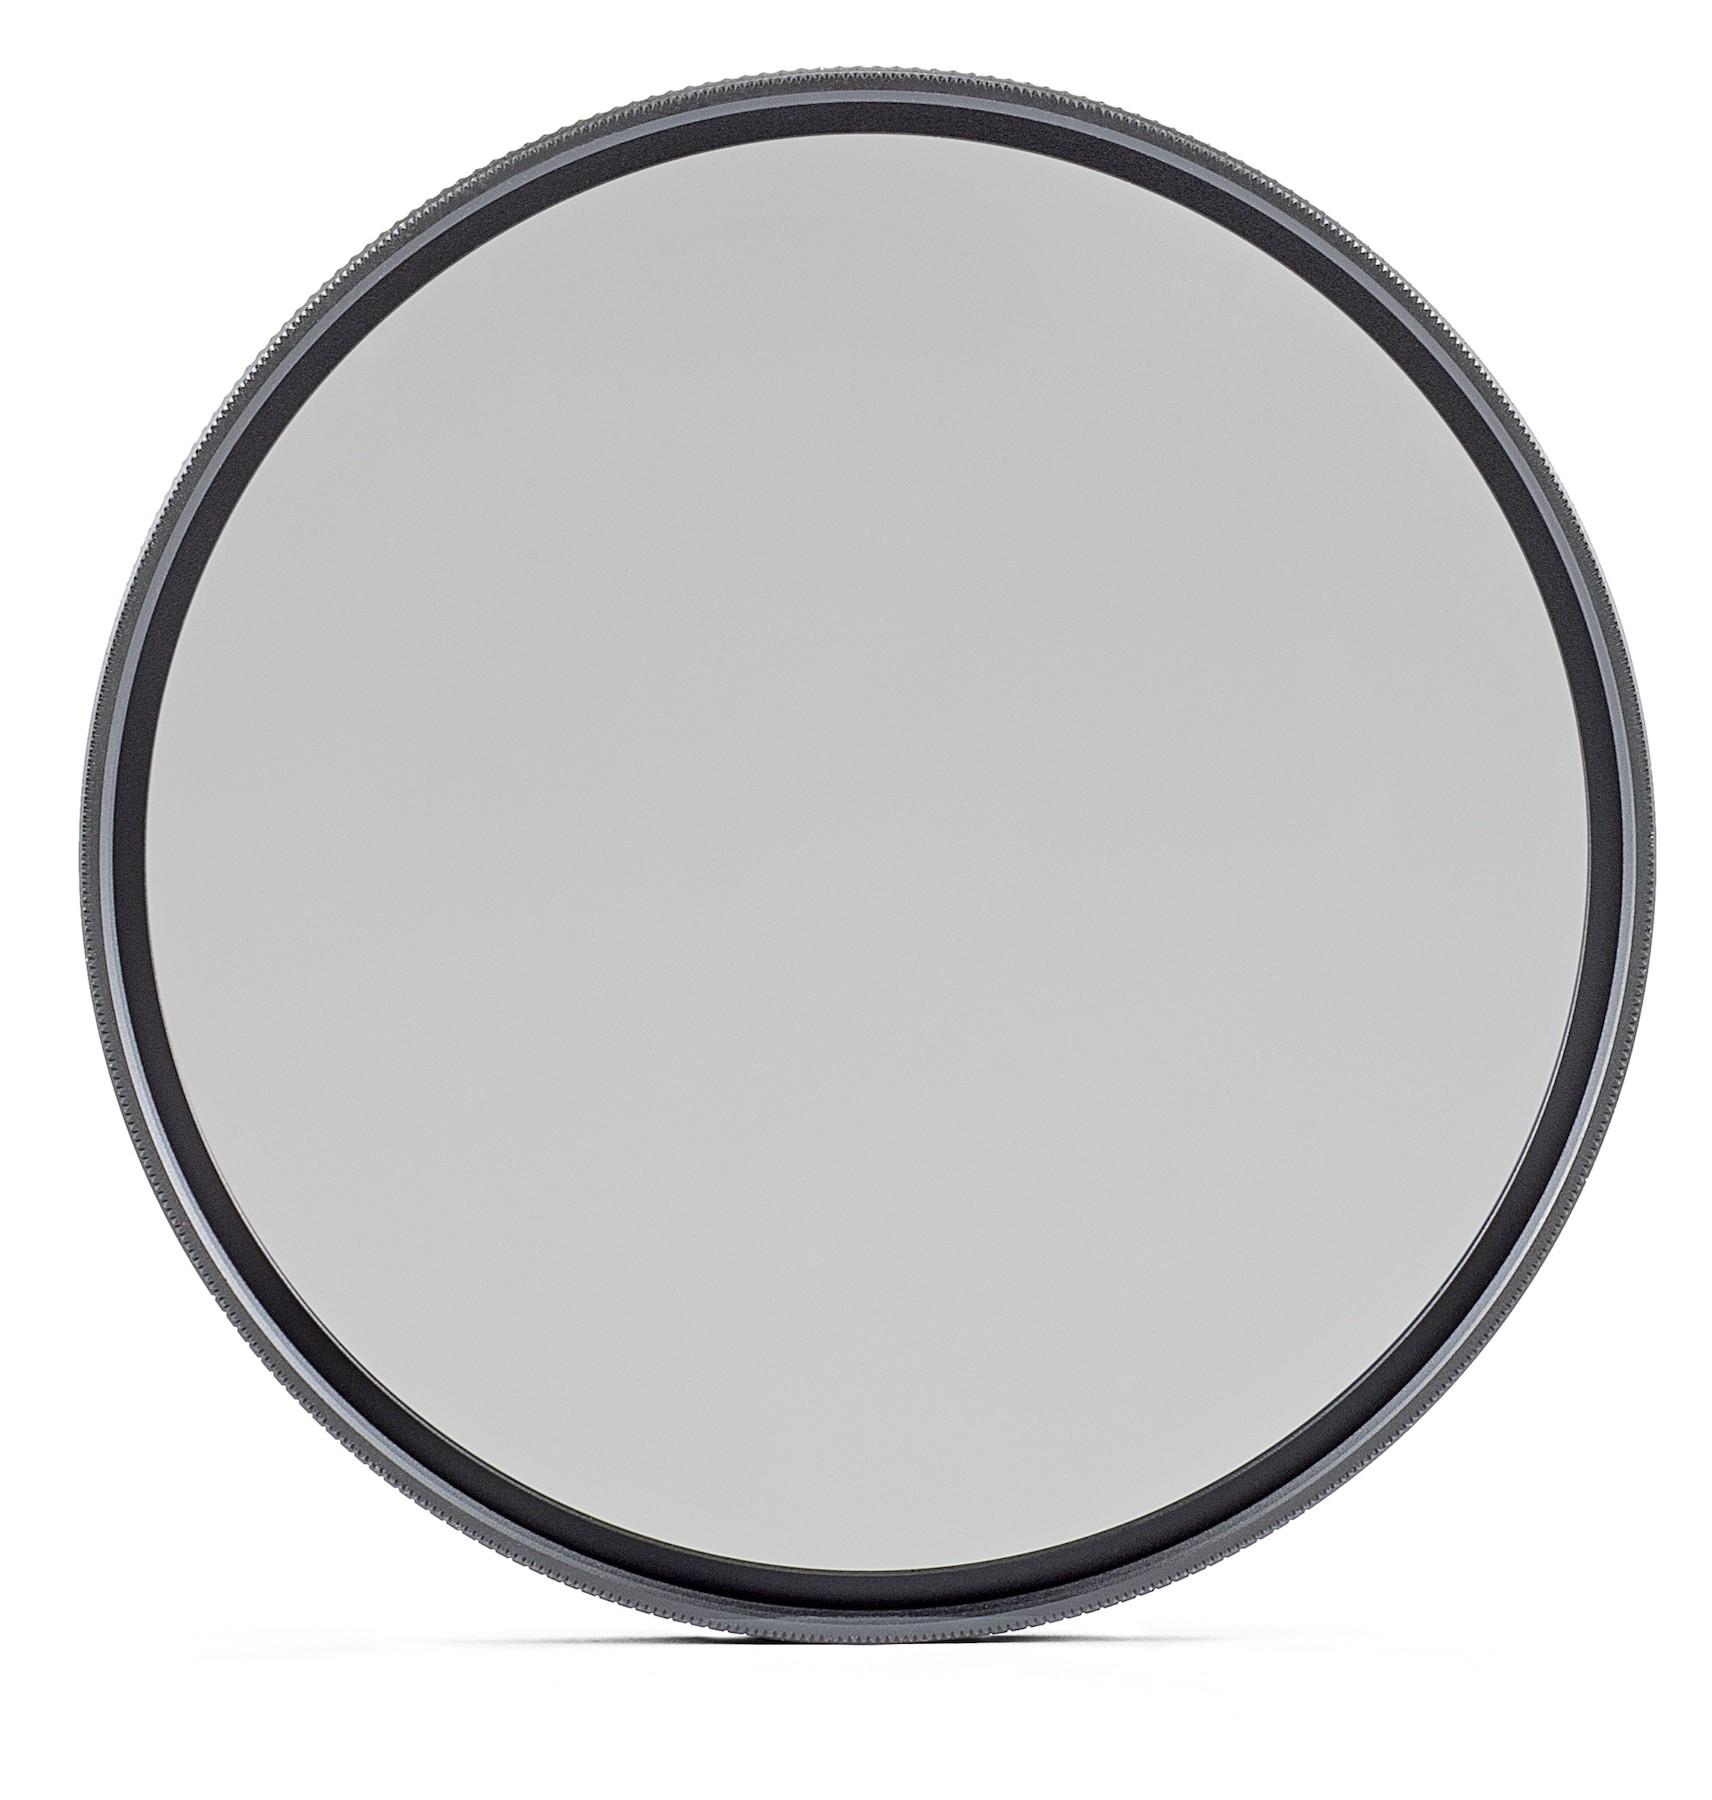 82mm Professional Circular Polarising Filter